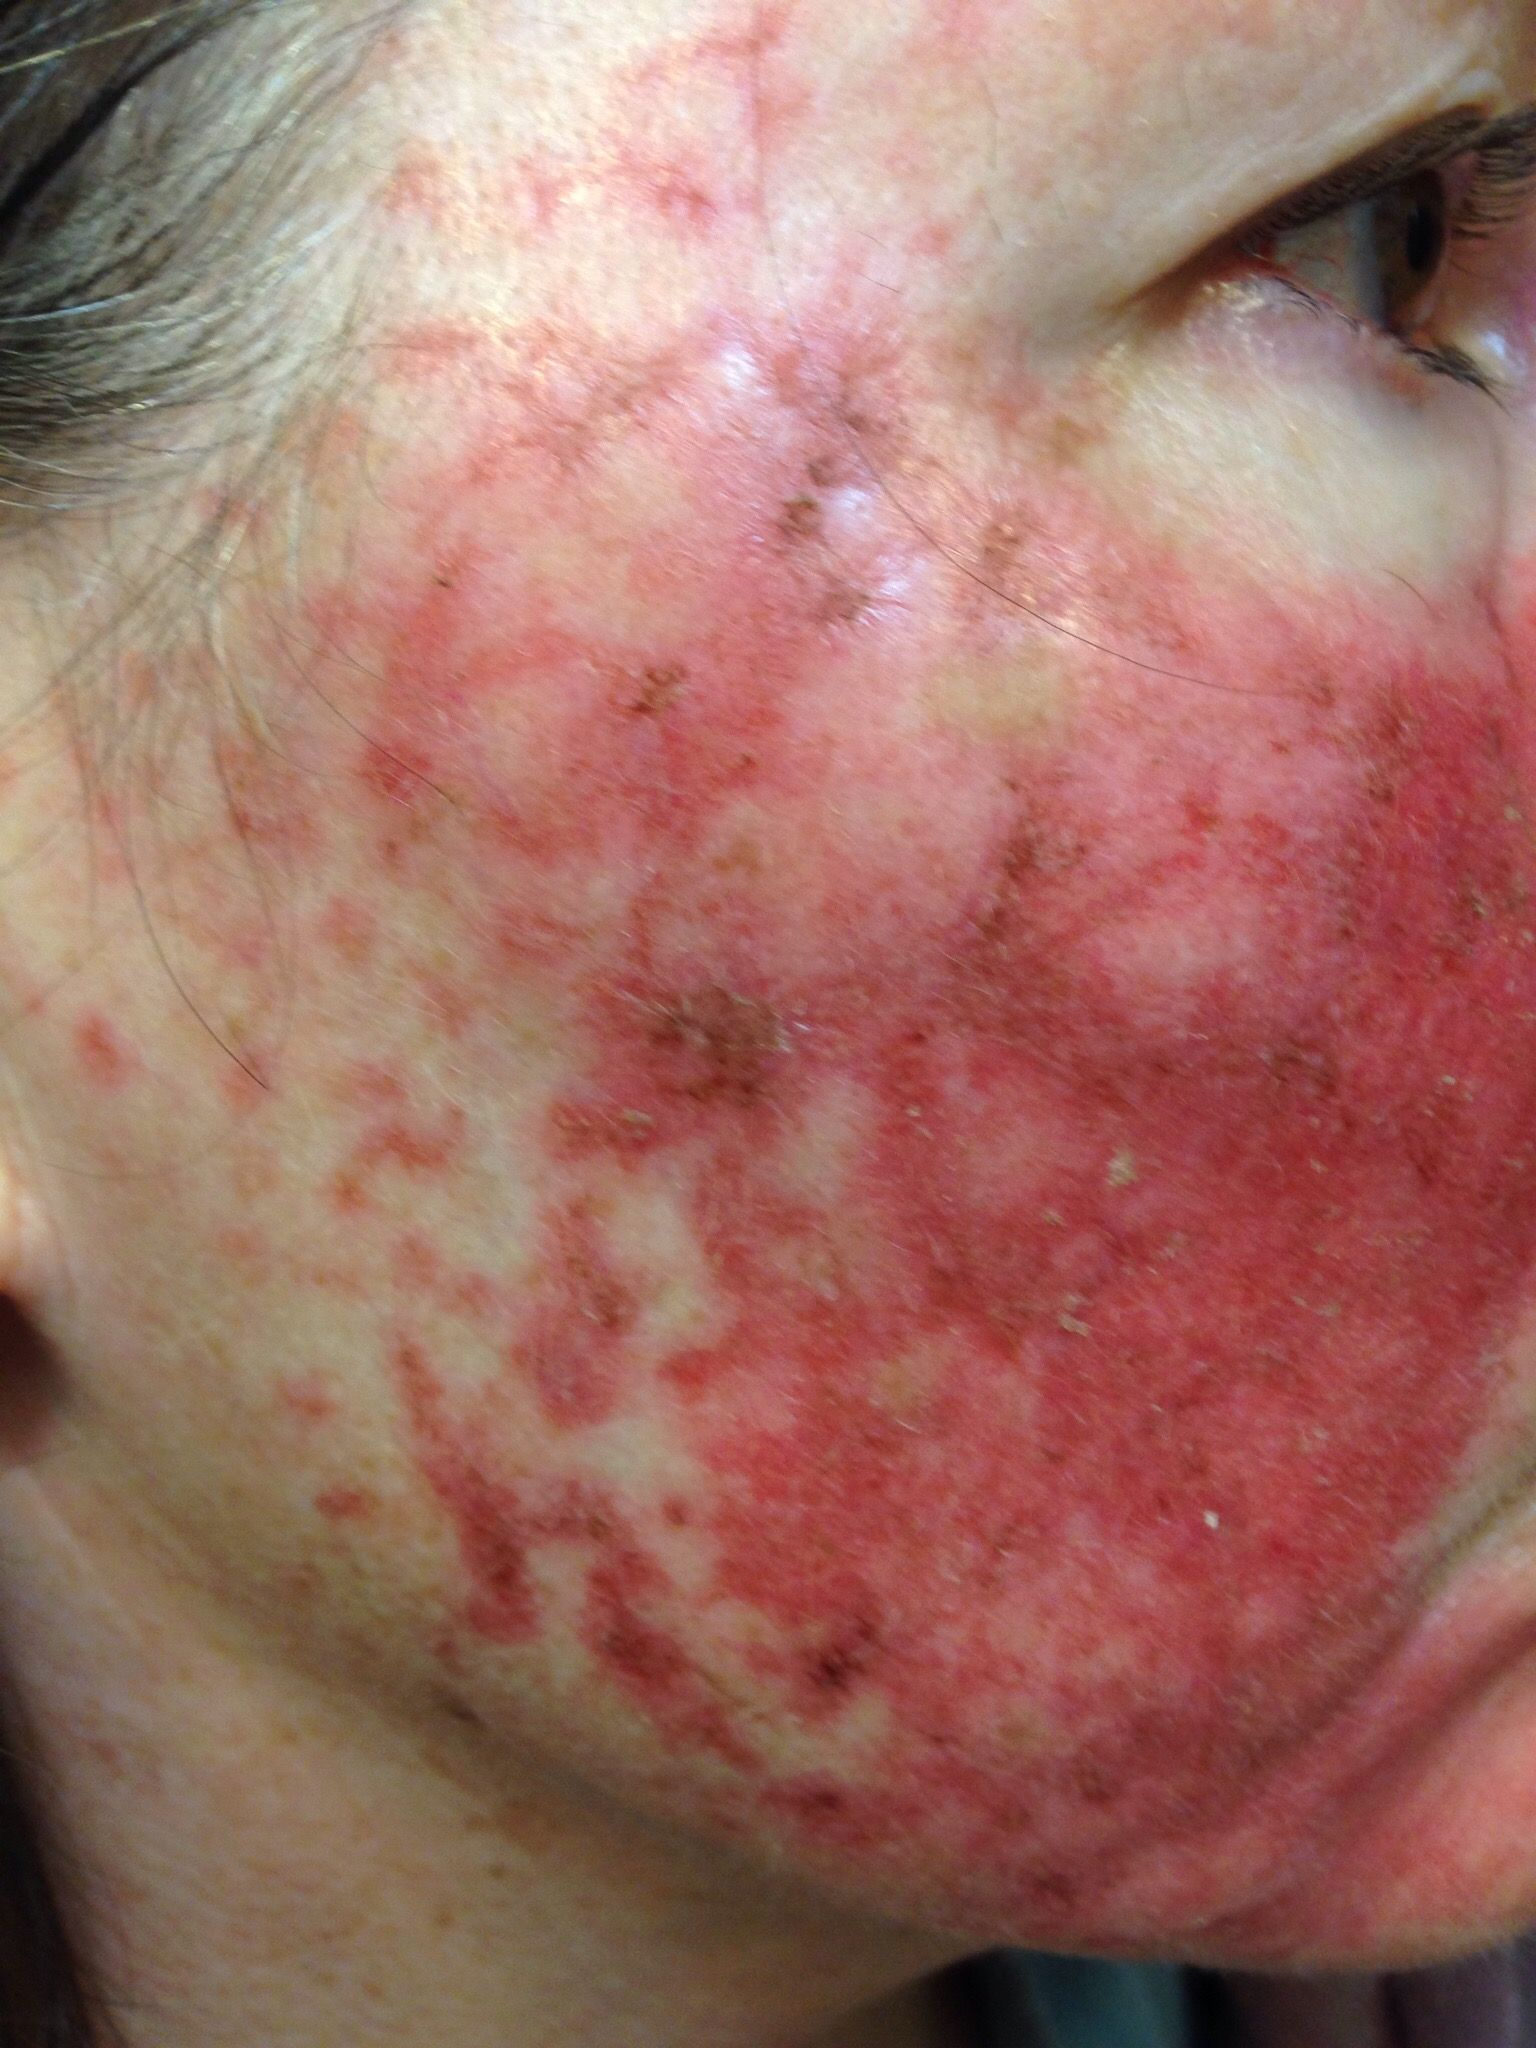 Skin Cancer Treatment Fluorouracil Day 18 19 A Thousand Words